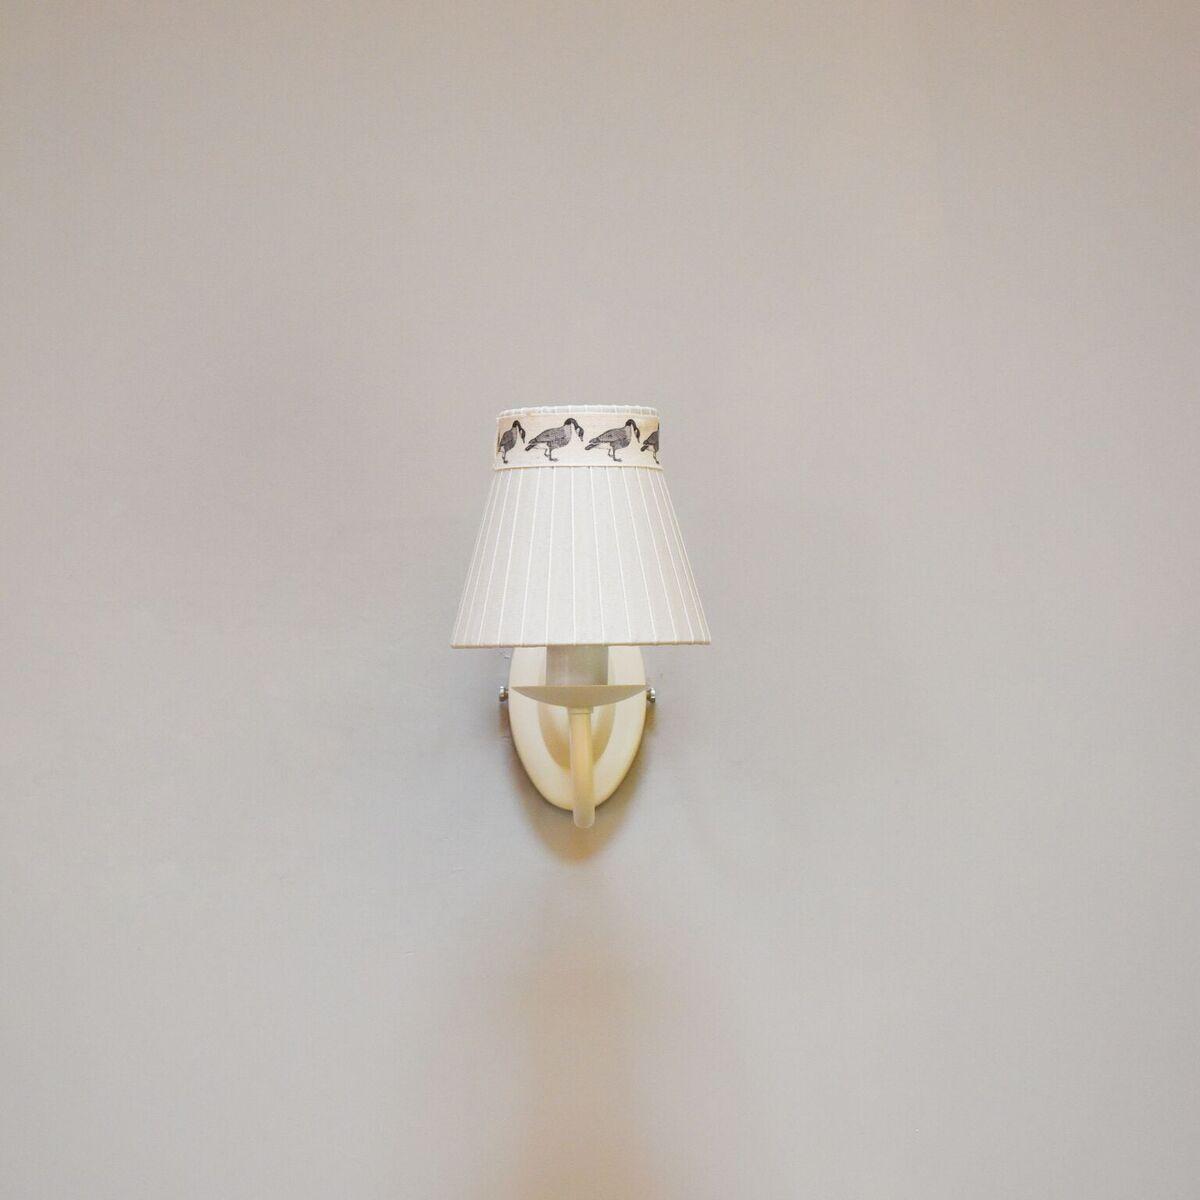 Kingston wall light single